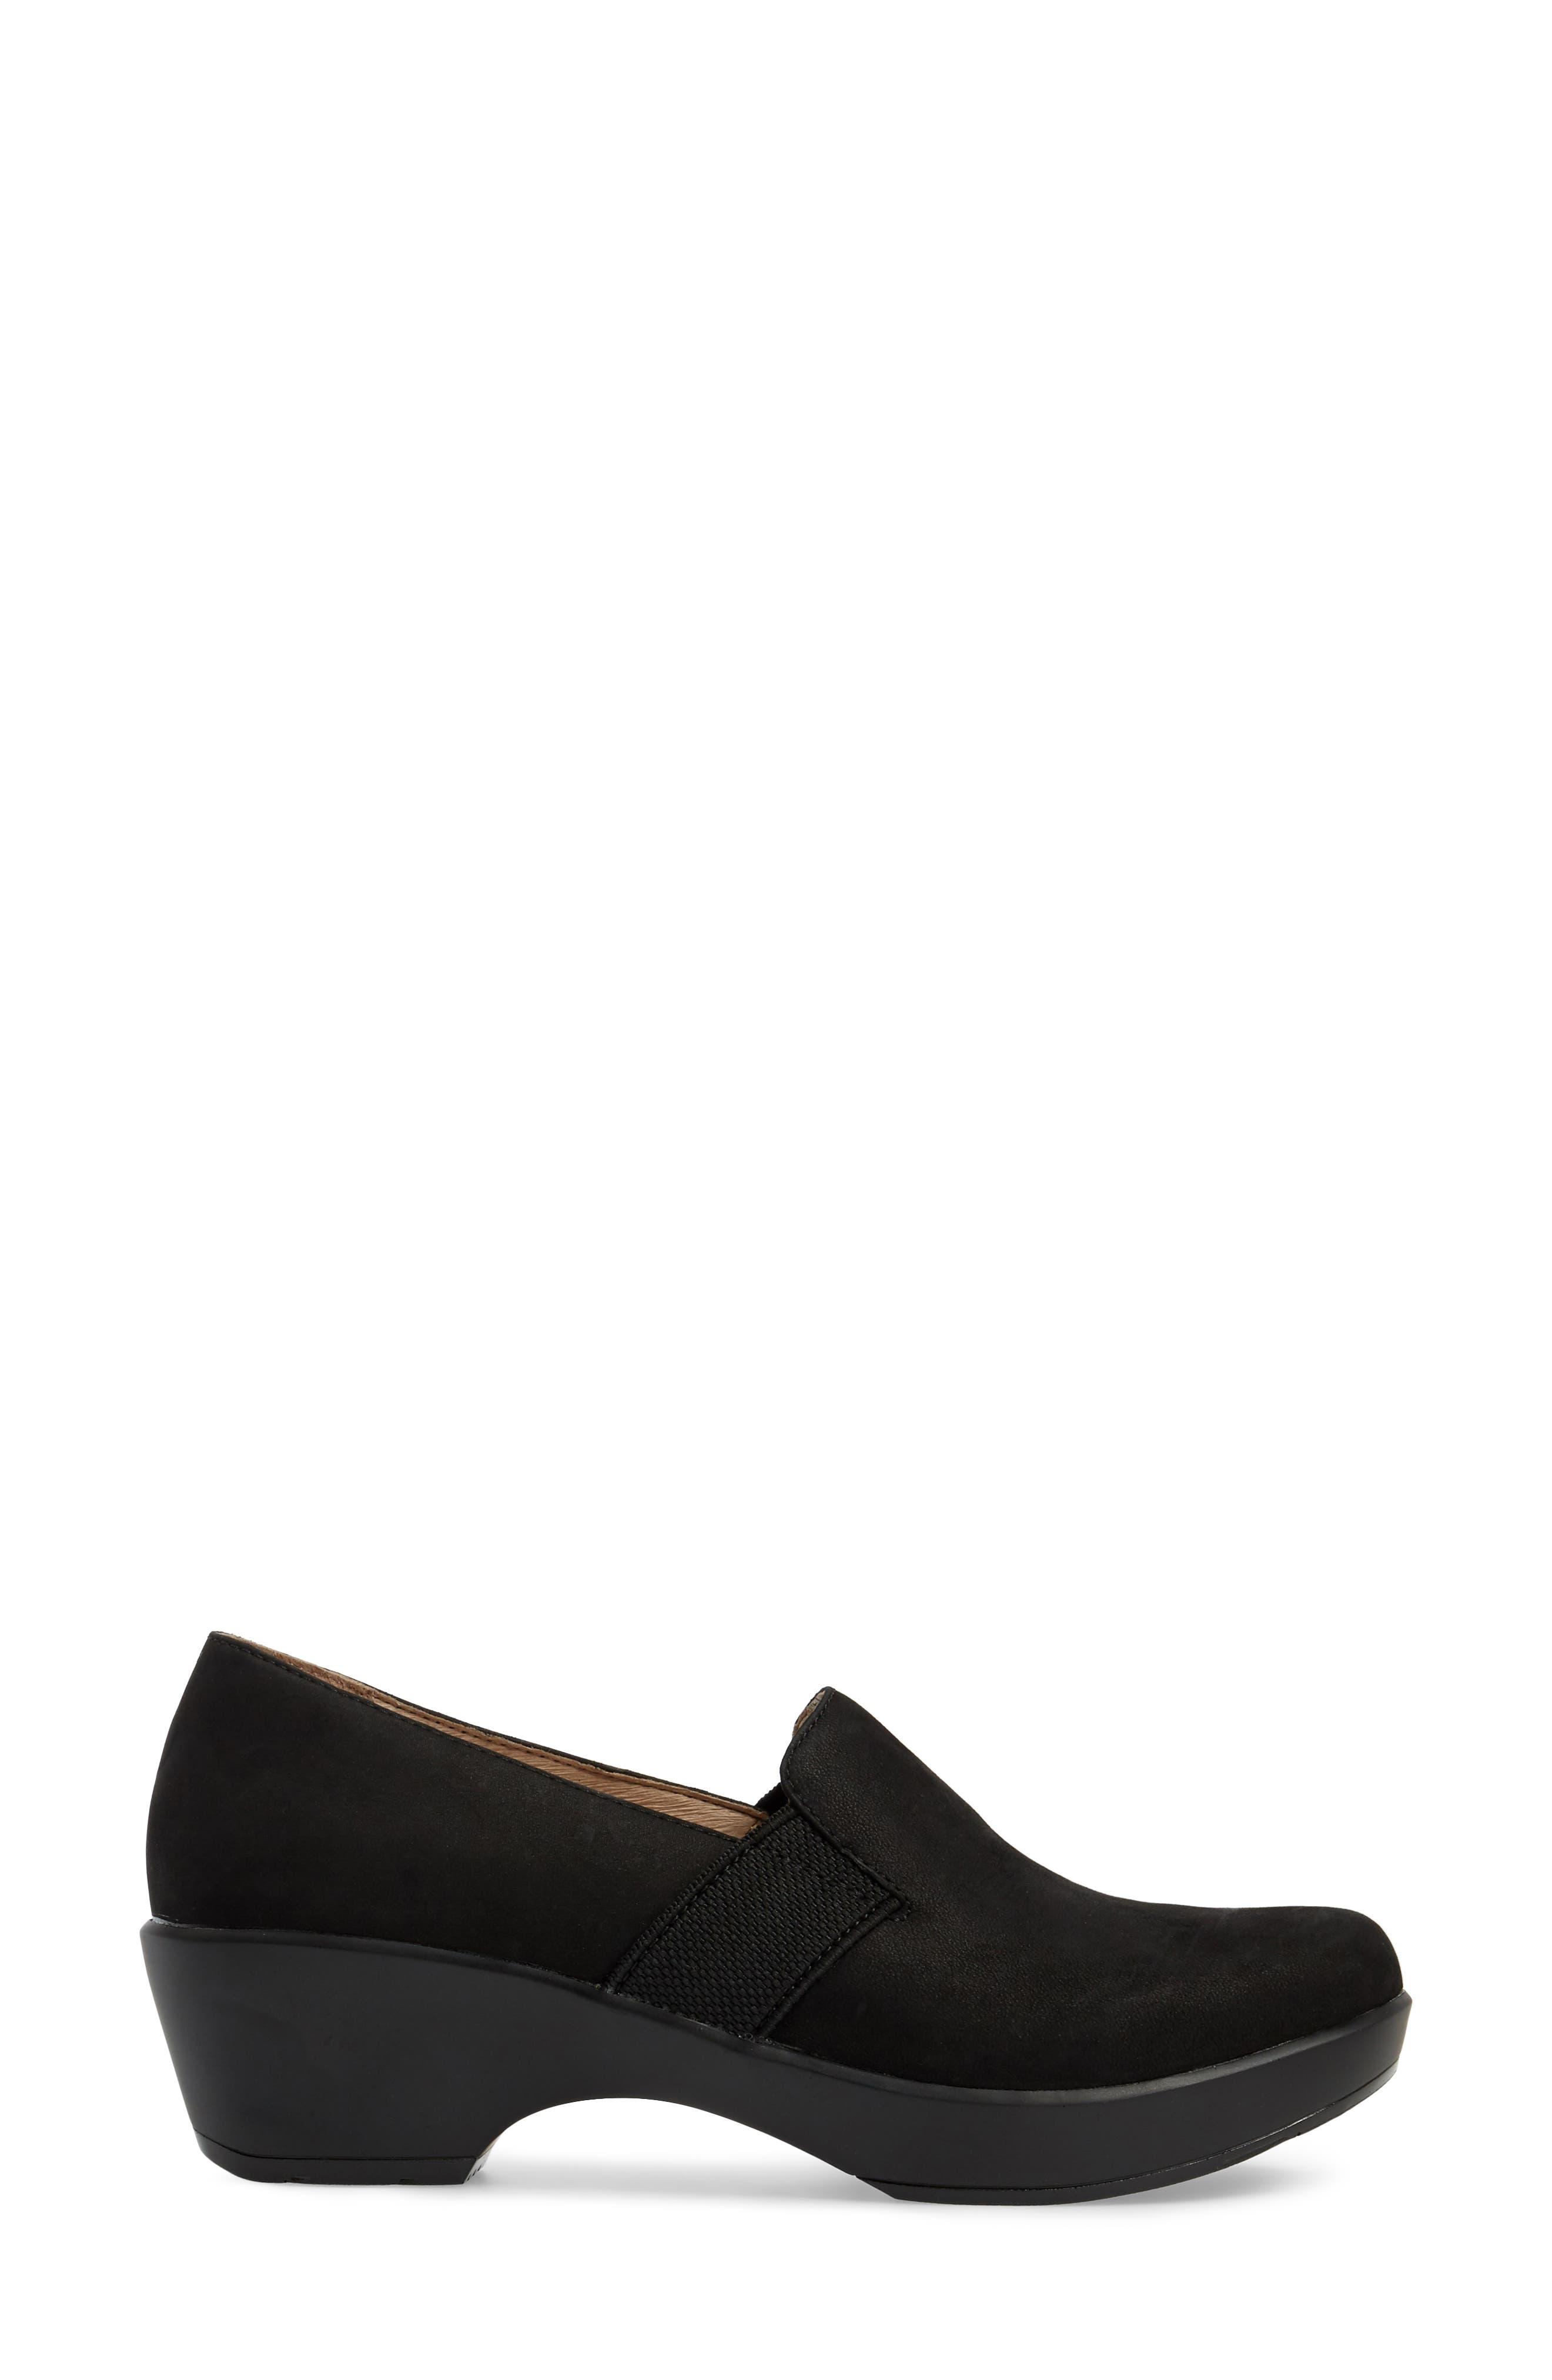 Alternate Image 3  - Dansko 'Jessica' Platform Loafer (Women)